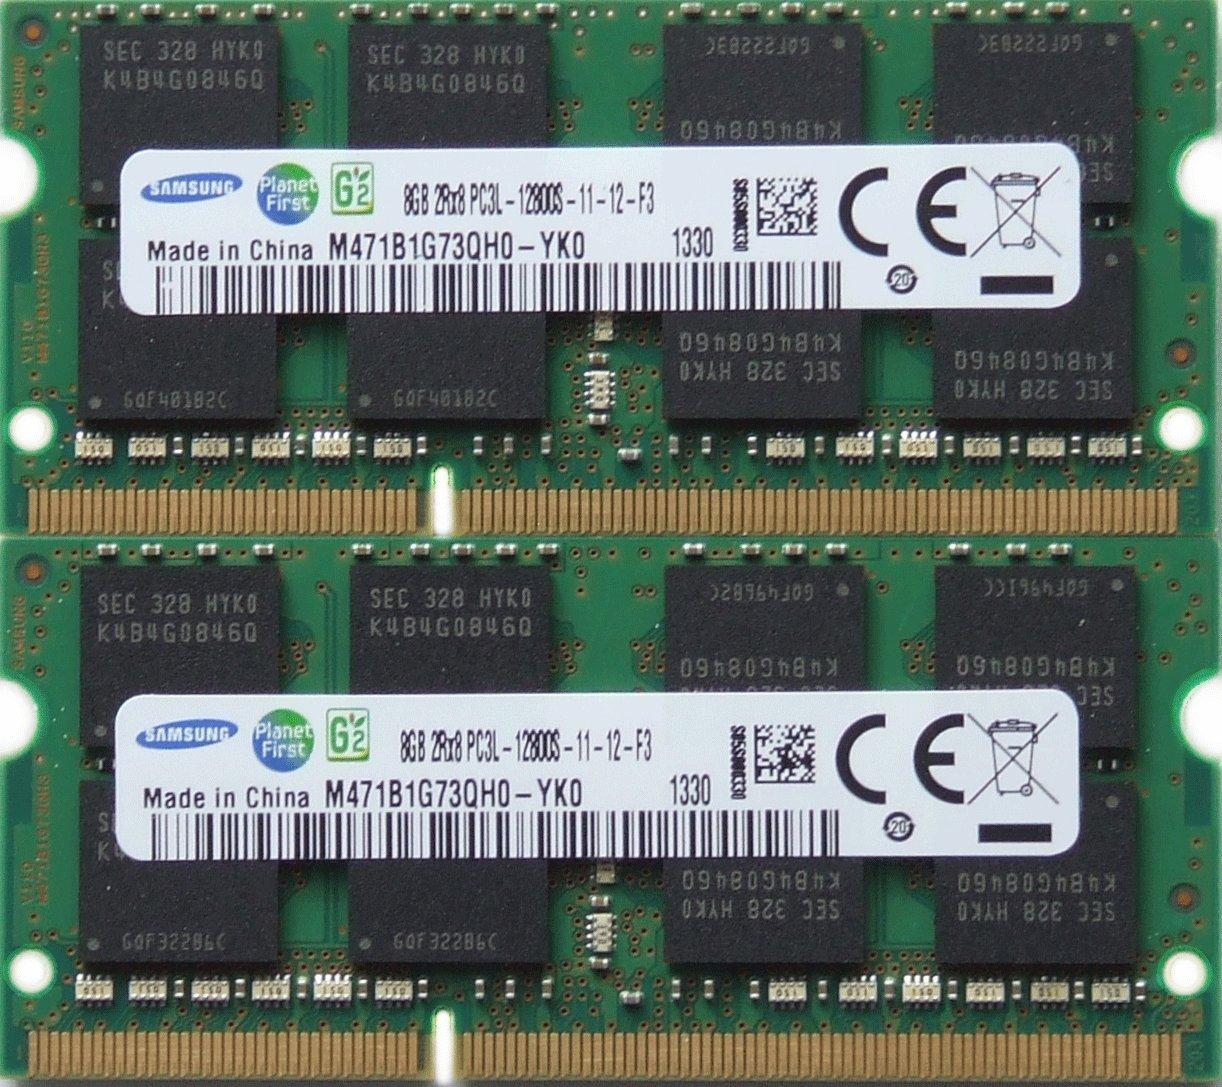 Samsung ram memory upgrade DDR3 PC3 12800, 1600MHz, 204 PIN, SODIMM for 2012 Apple Macbook Pro's, 2012 iMac's, and 2011 / 2012 Mac mini's (16GB kit ( 2 x 8GB ))